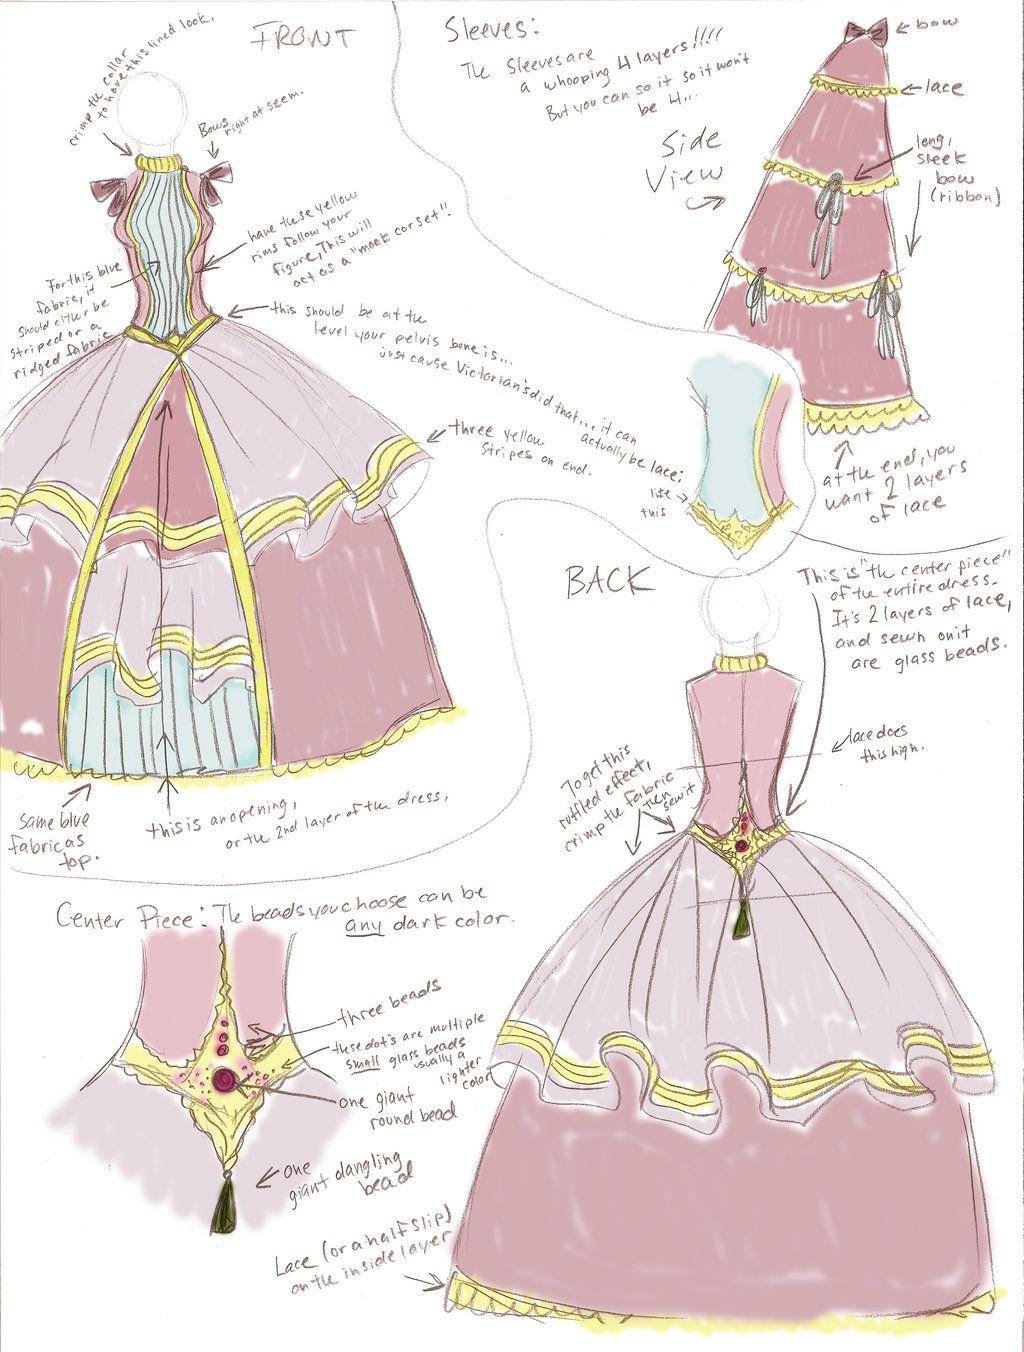 Victorian era dress colors for dark